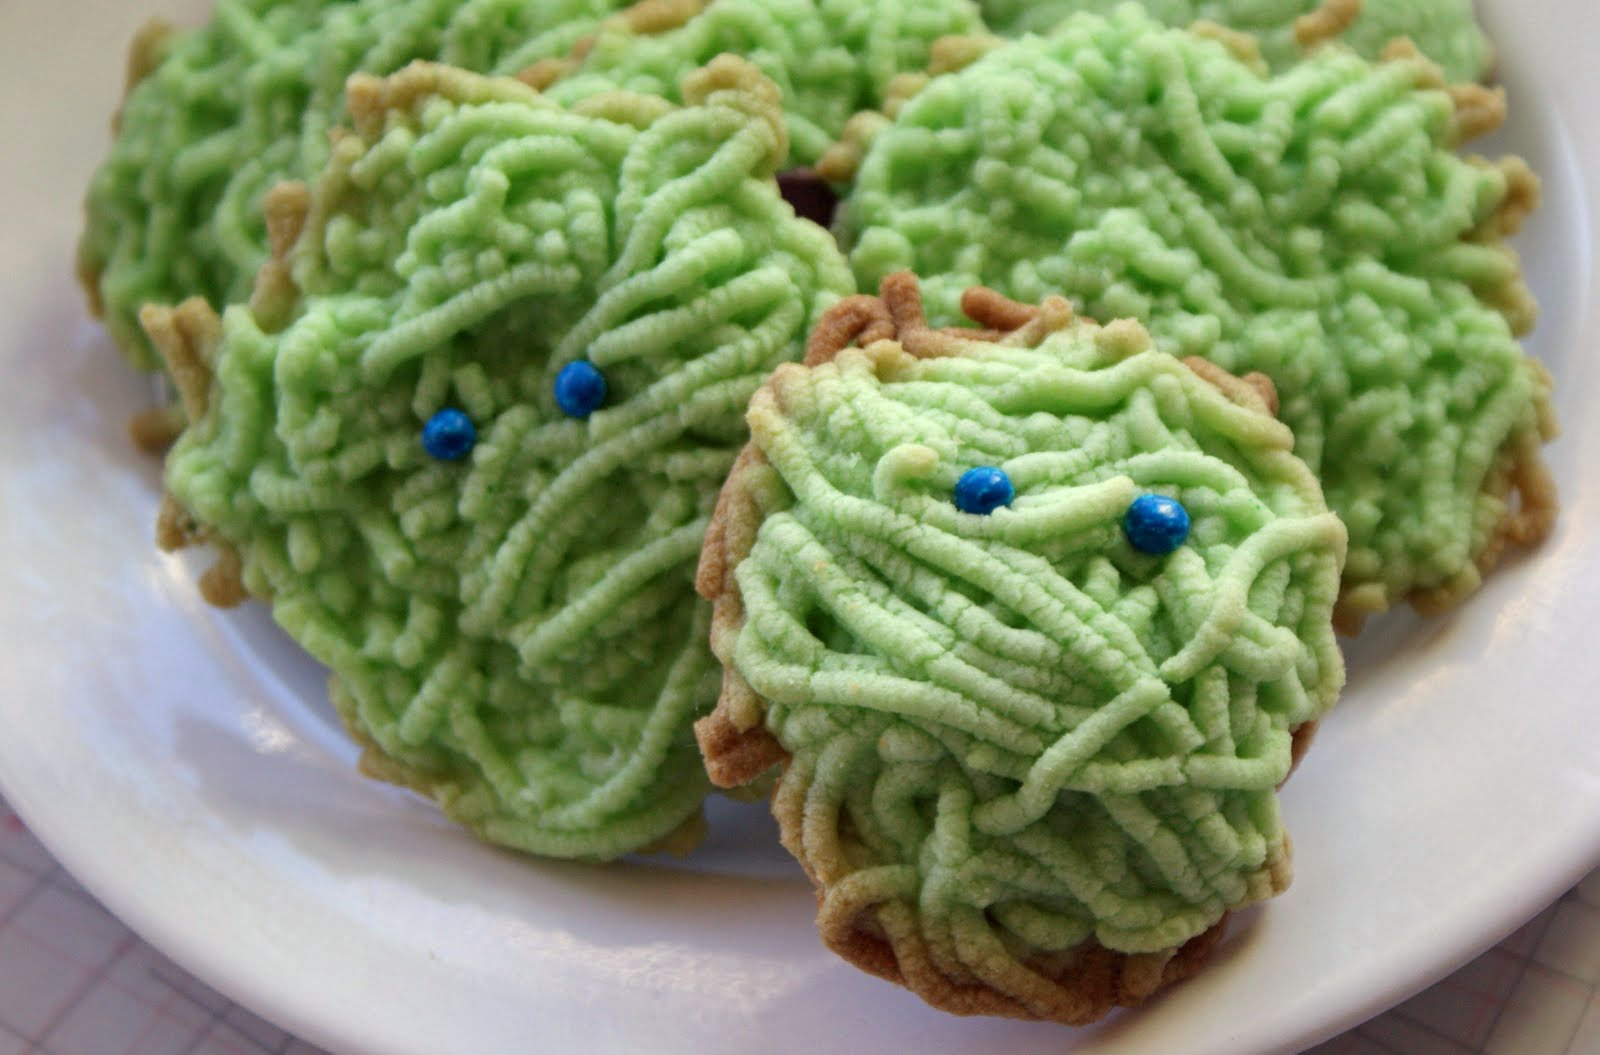 Shaggy Monster Cookies